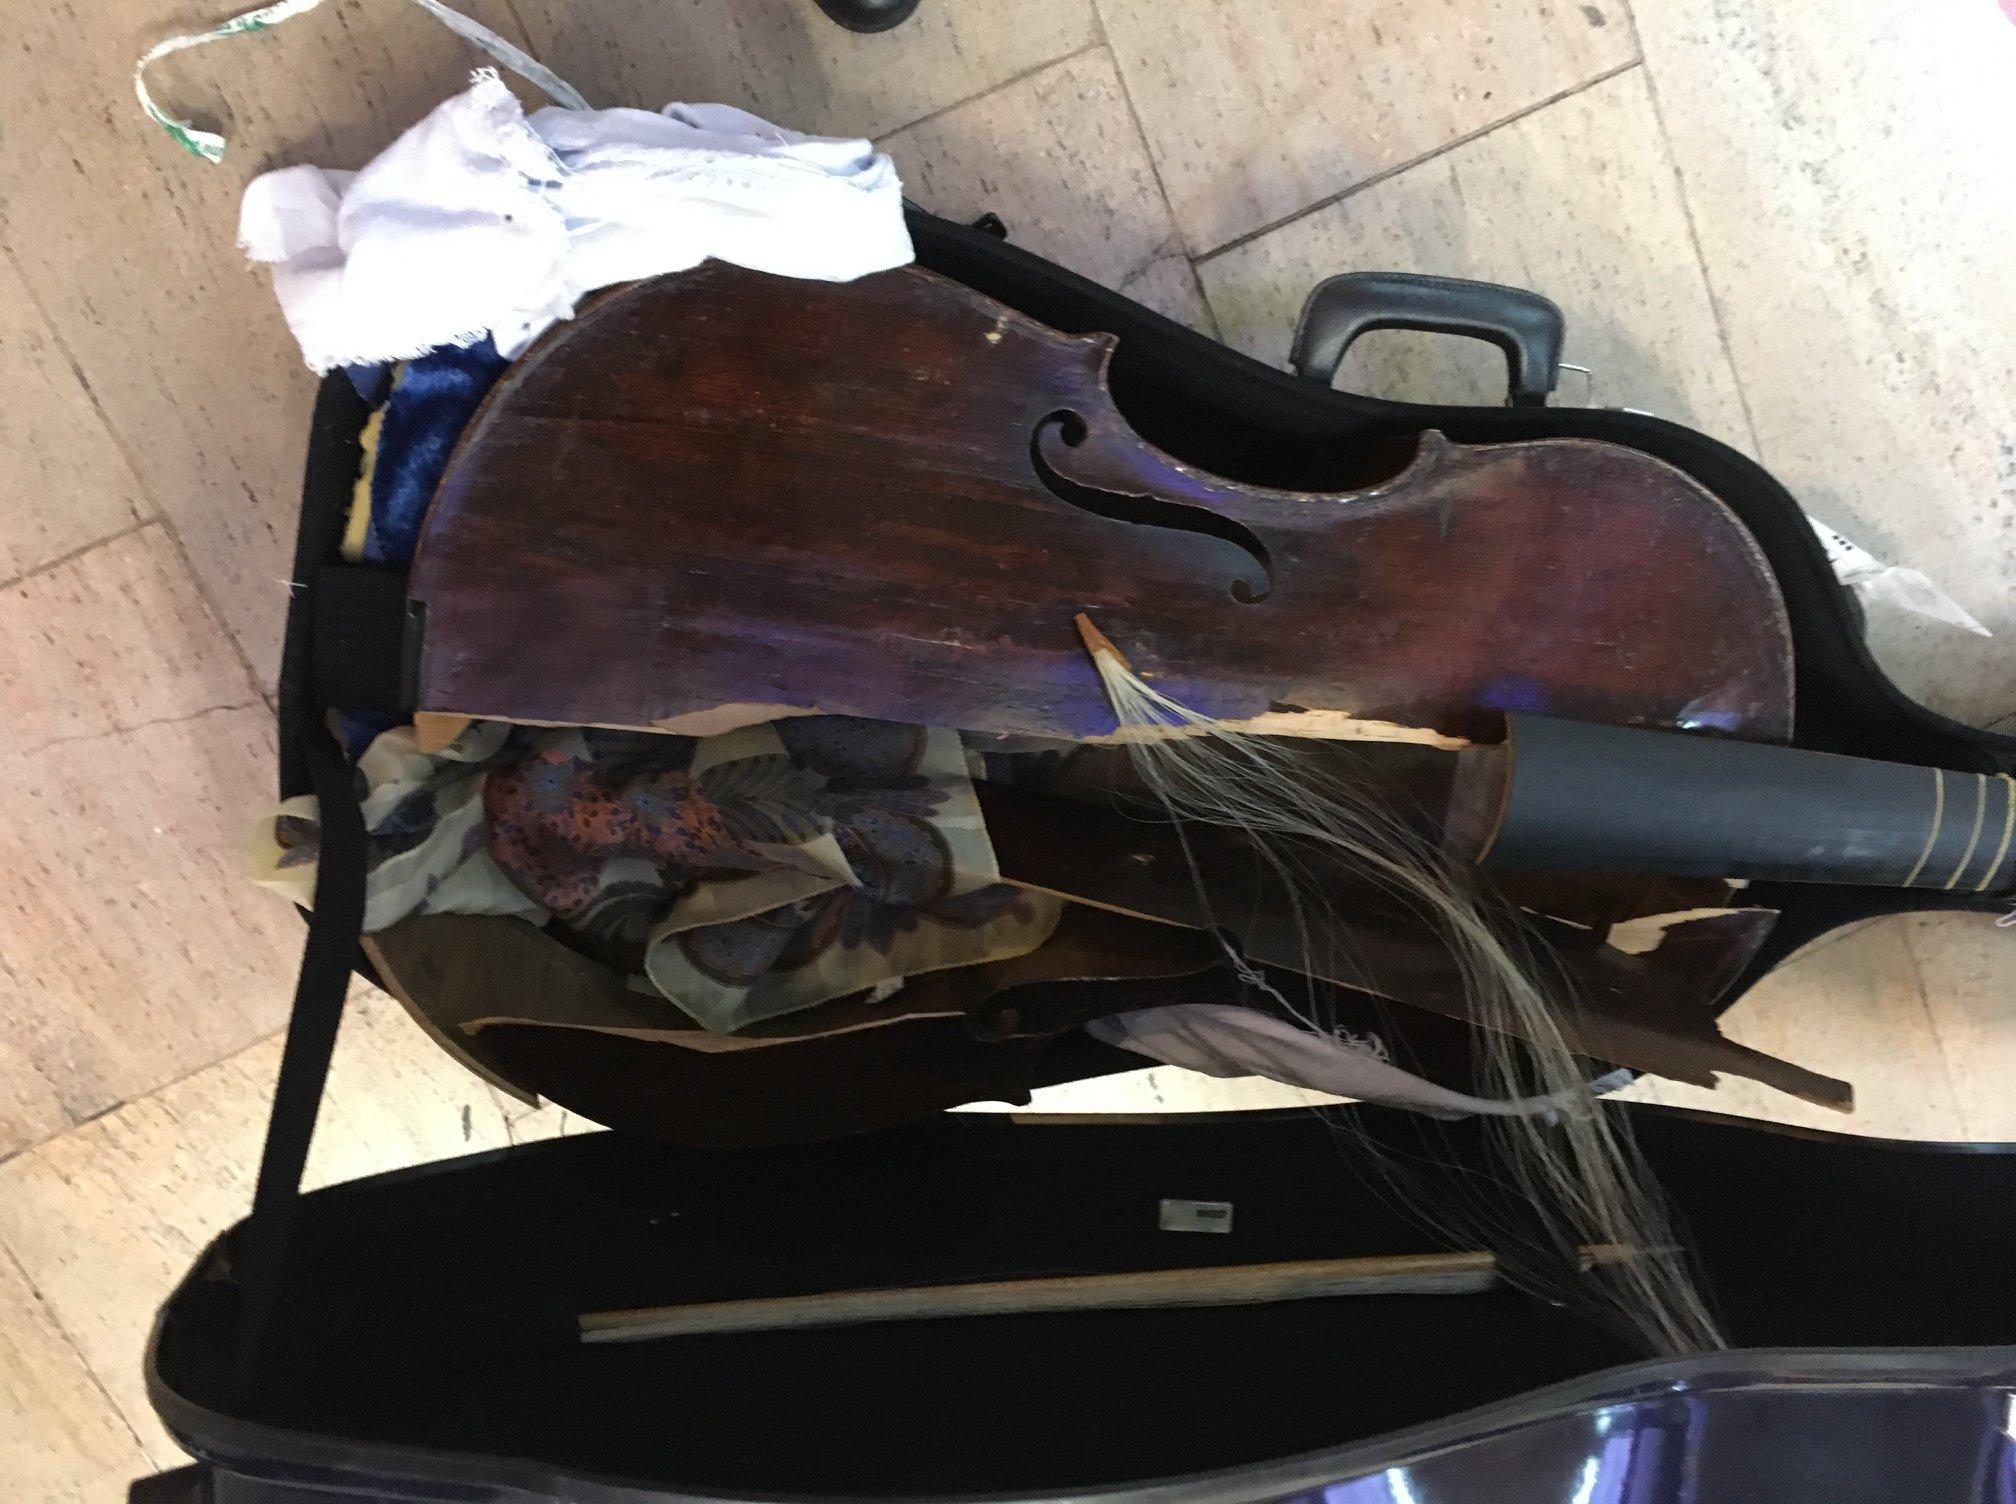 Cello destroyed